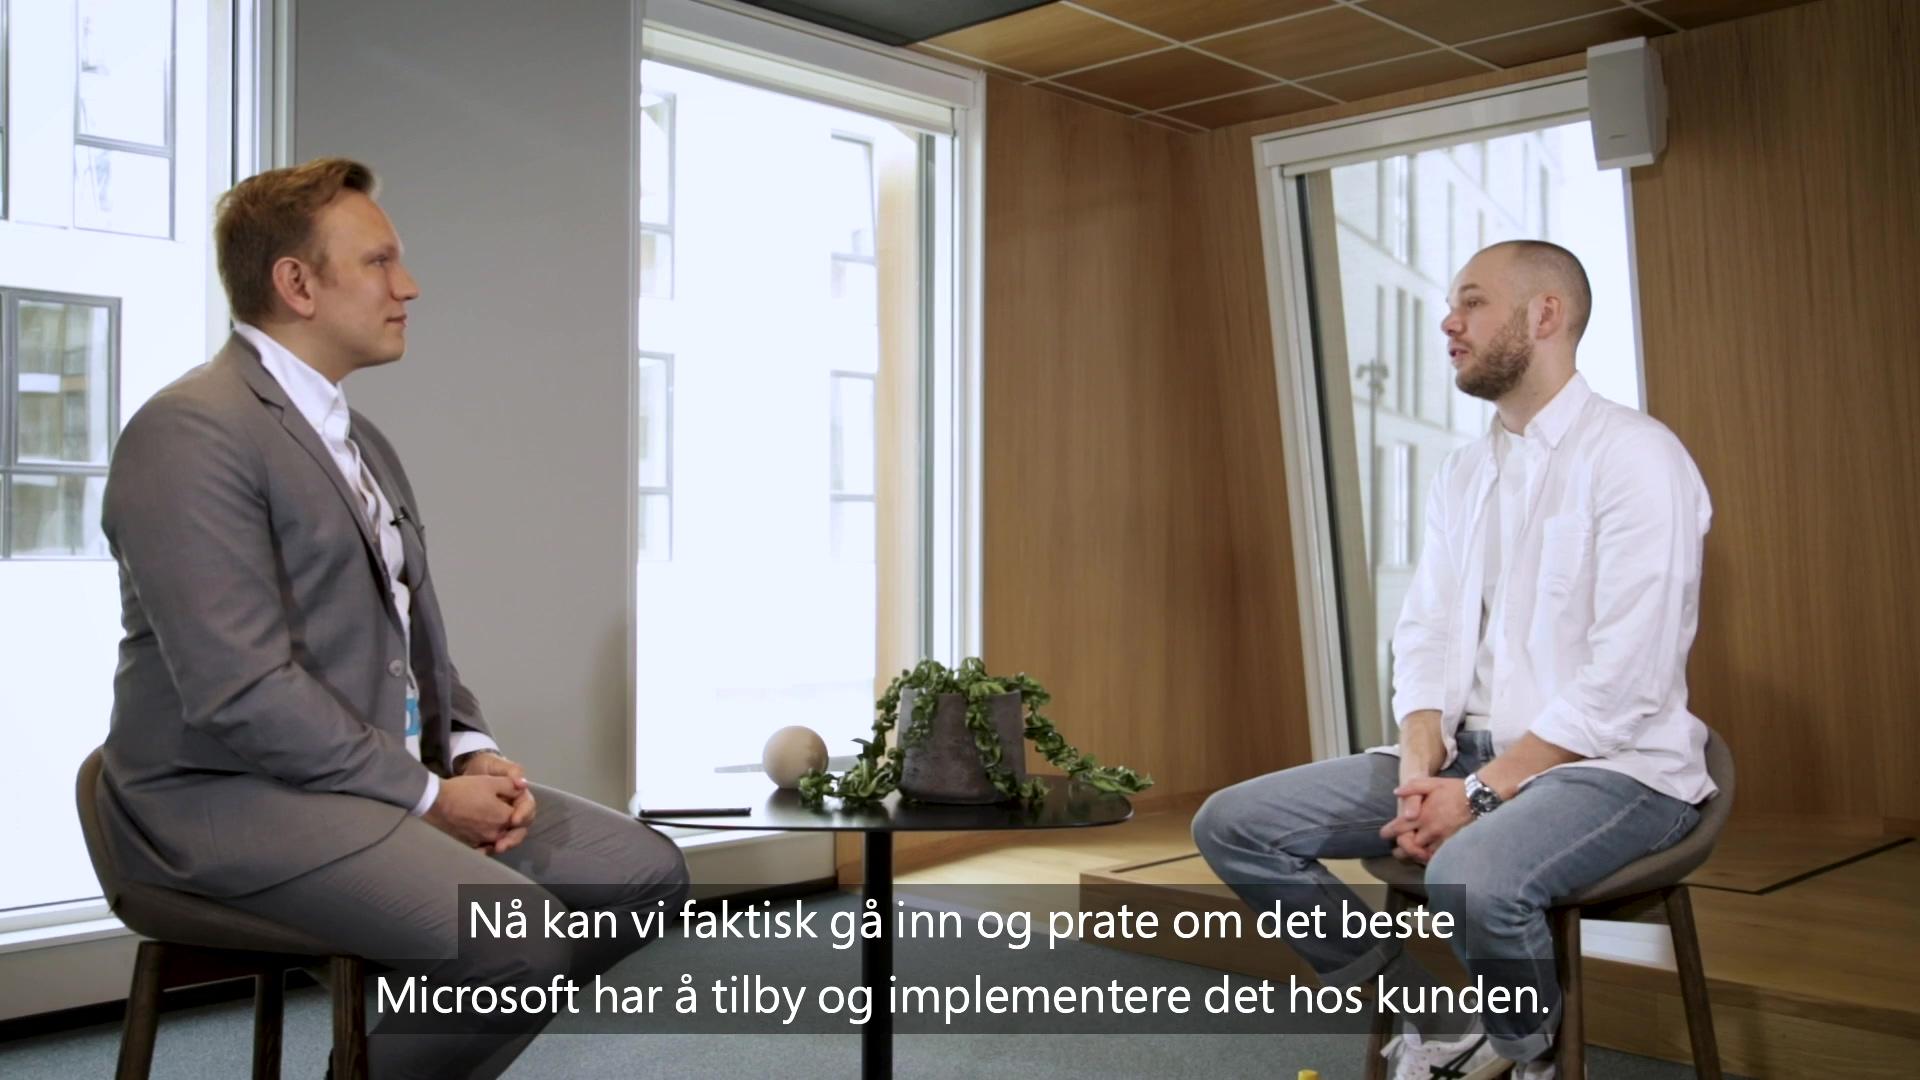 Microsoft-Atle-Spilde-Bendik-Berntsen_1080p_h264_Sub